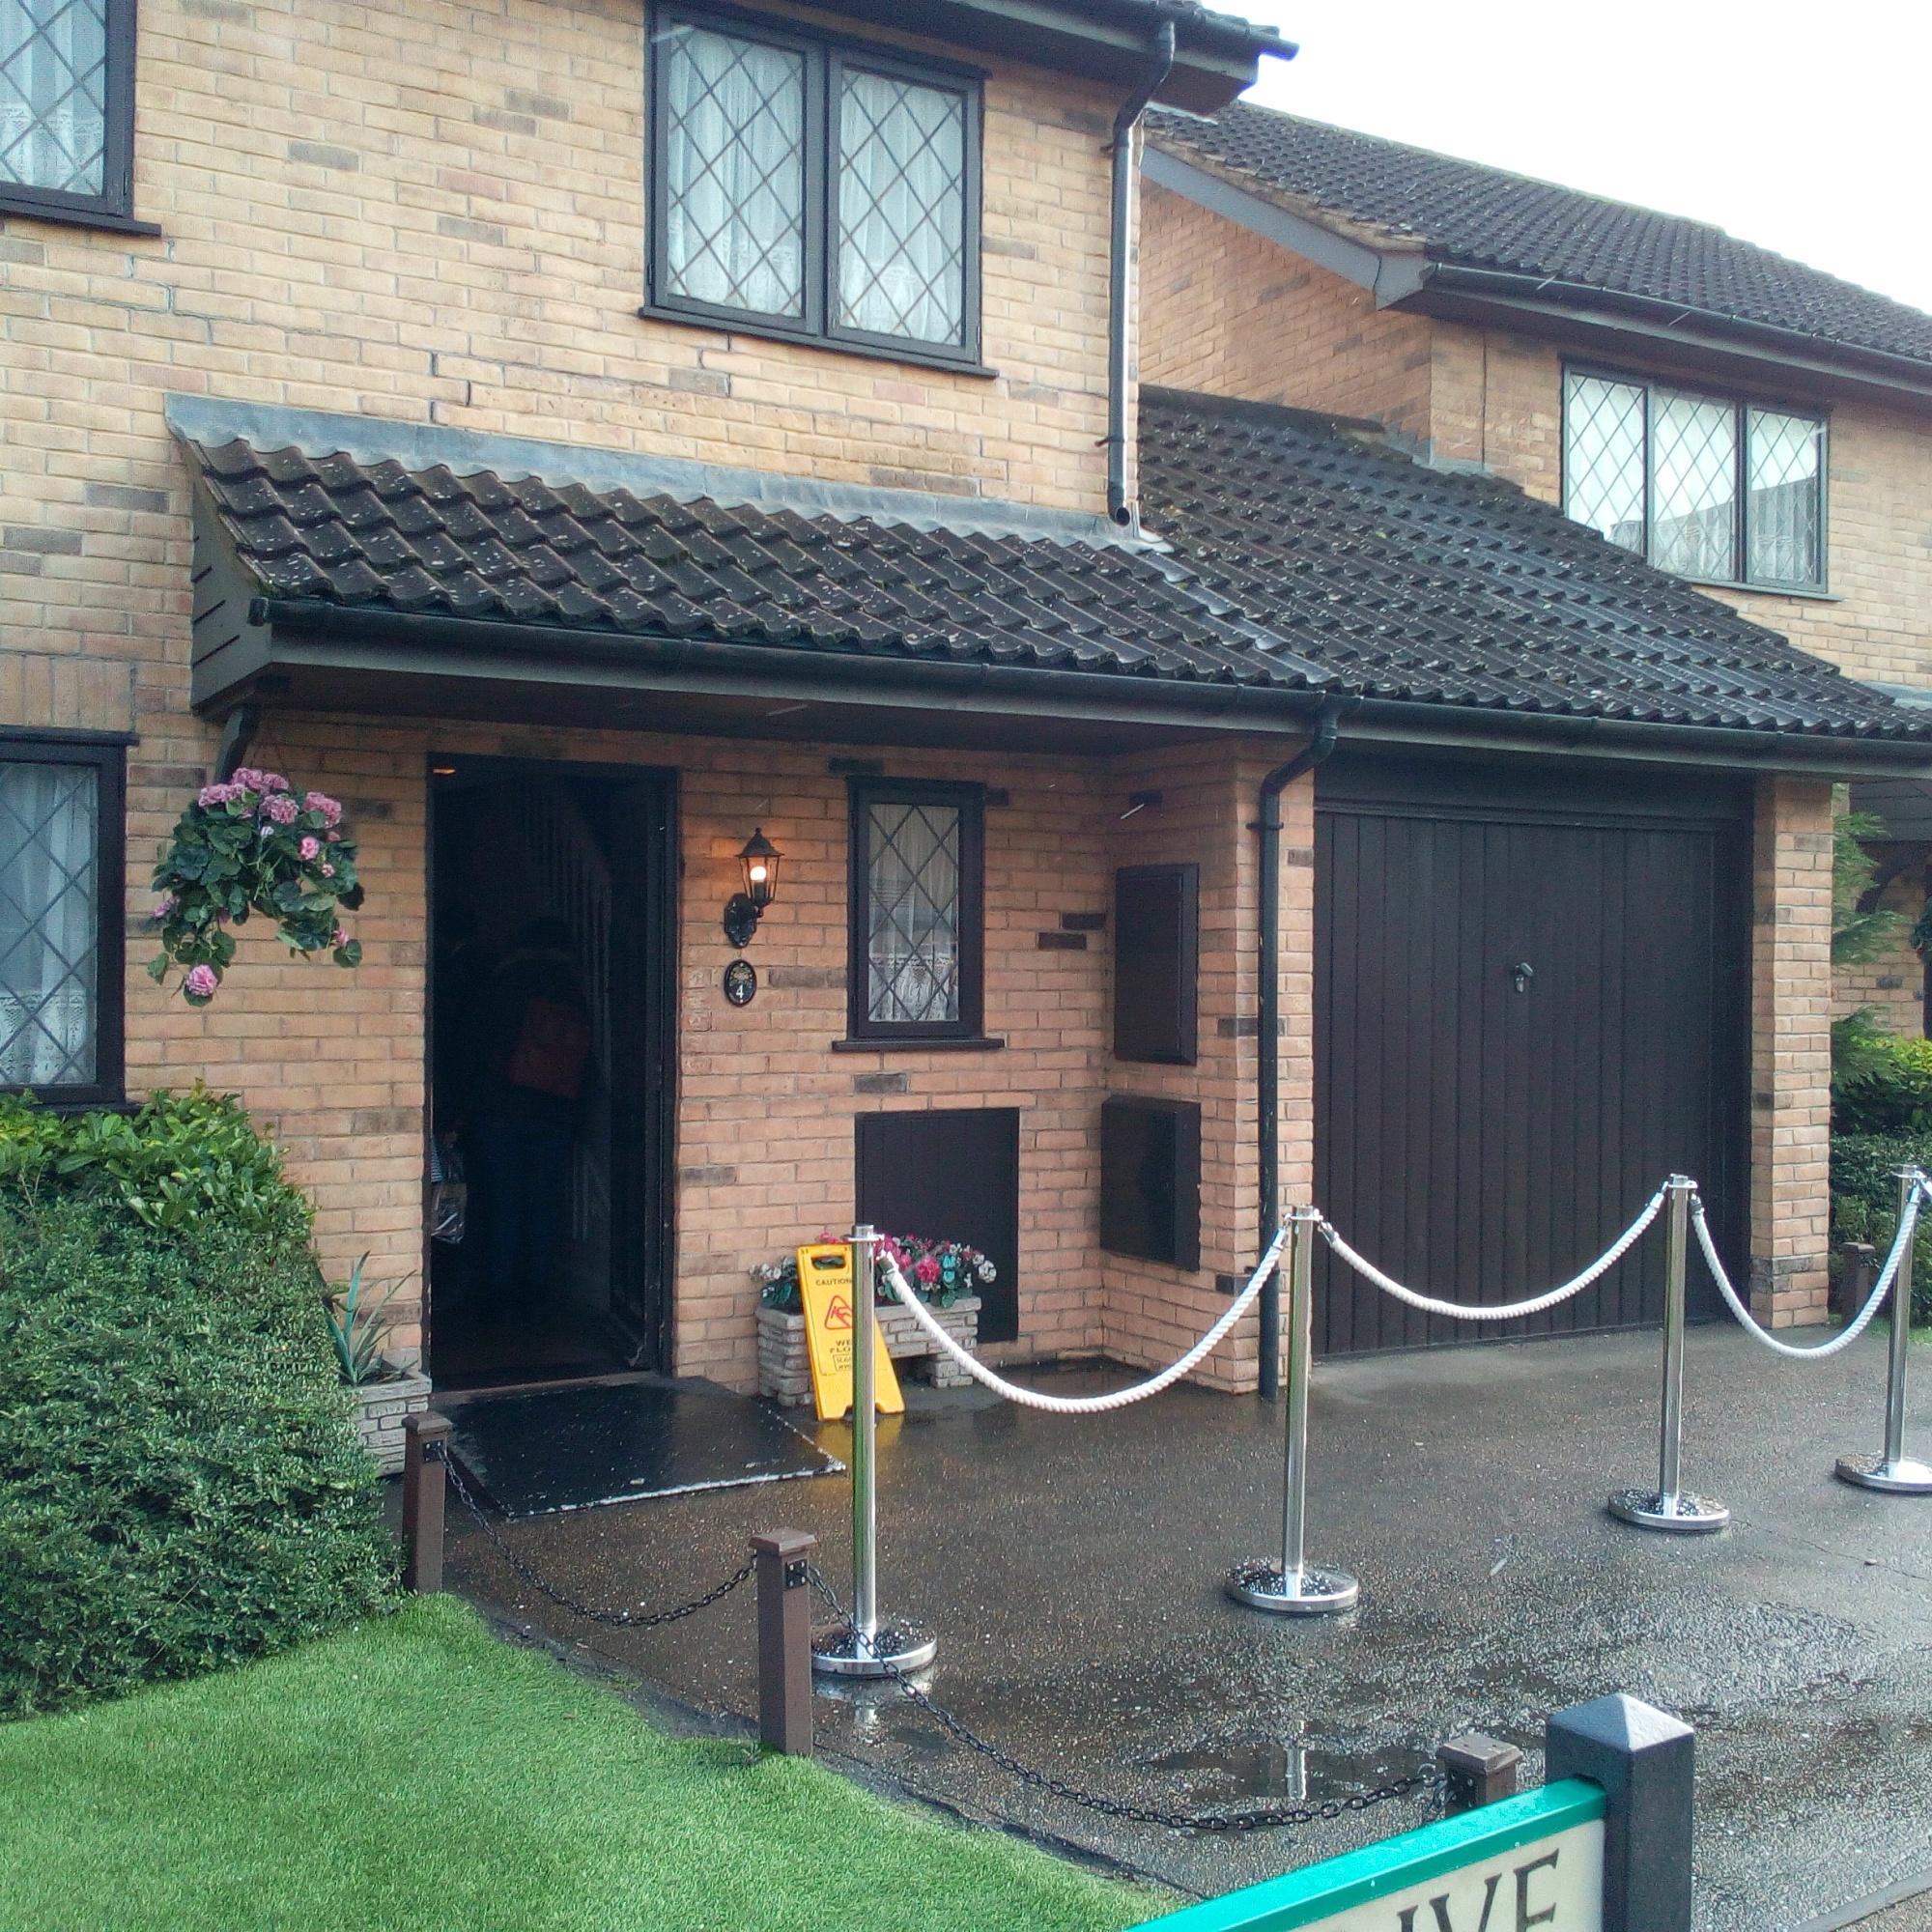 4, Privet Drive chez les Dursley - The Making of Harry Potter - Studio Tour London